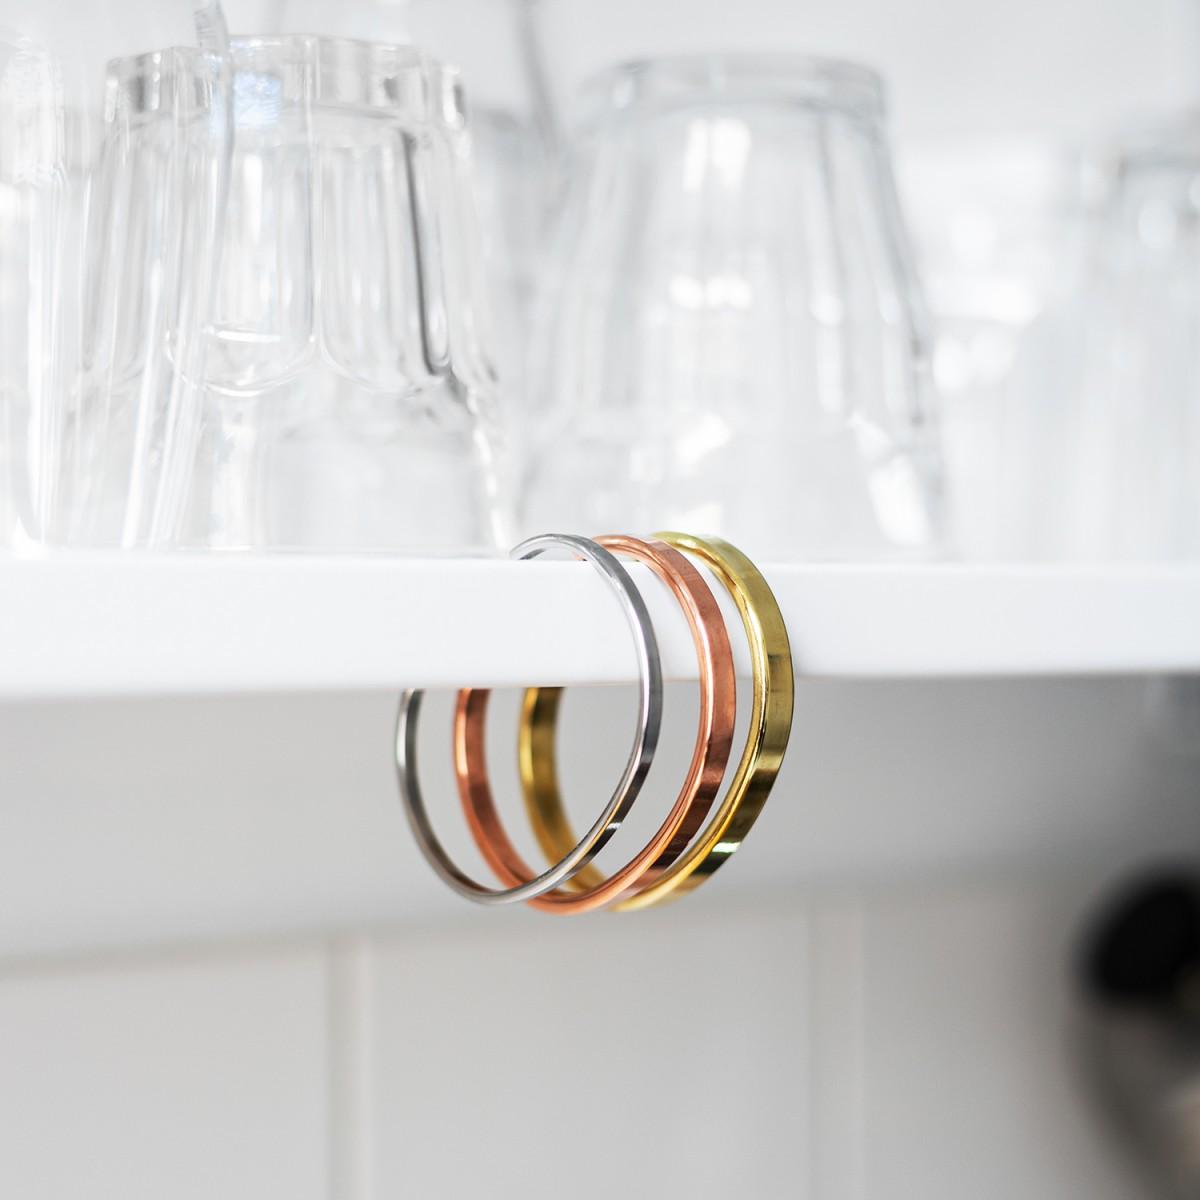 Lois Mathar – Armband Messing, mittel, 5 mm